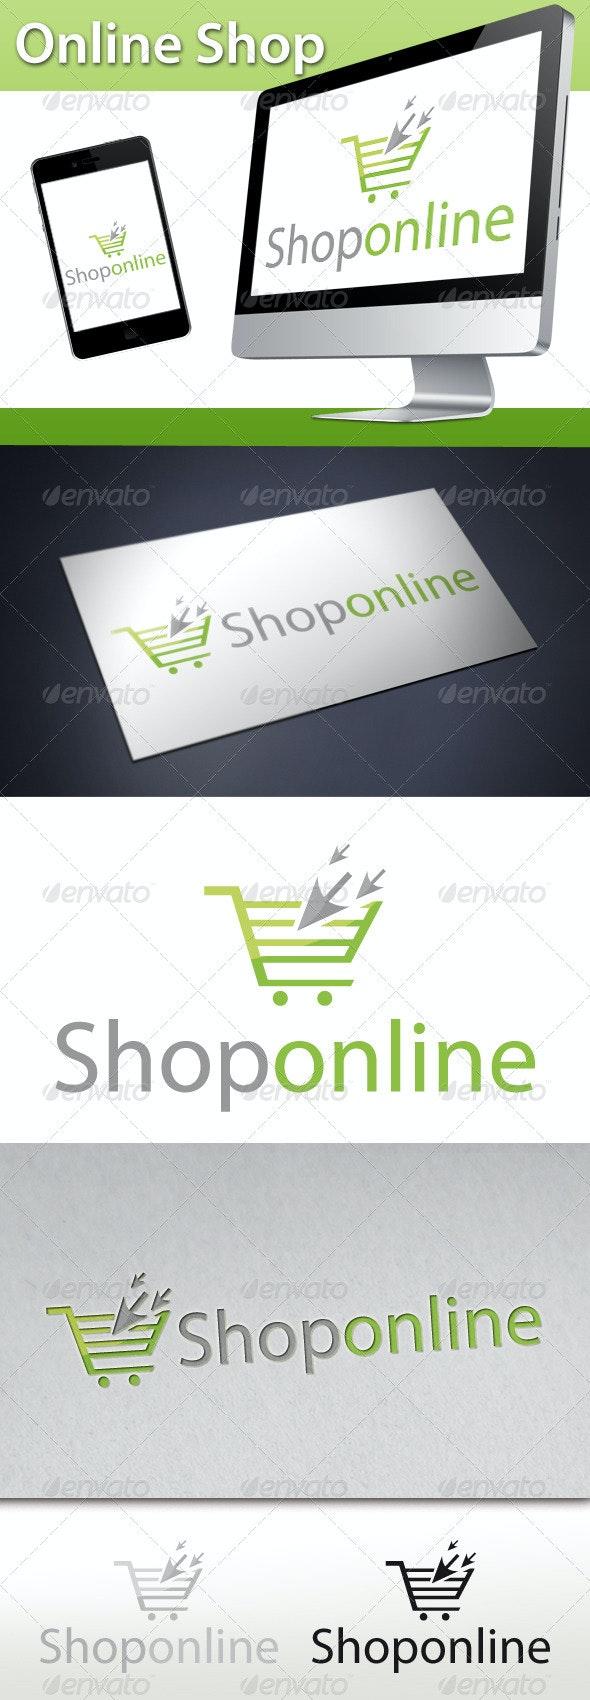 Online Shop Click Cart Logo - Objects Logo Templates